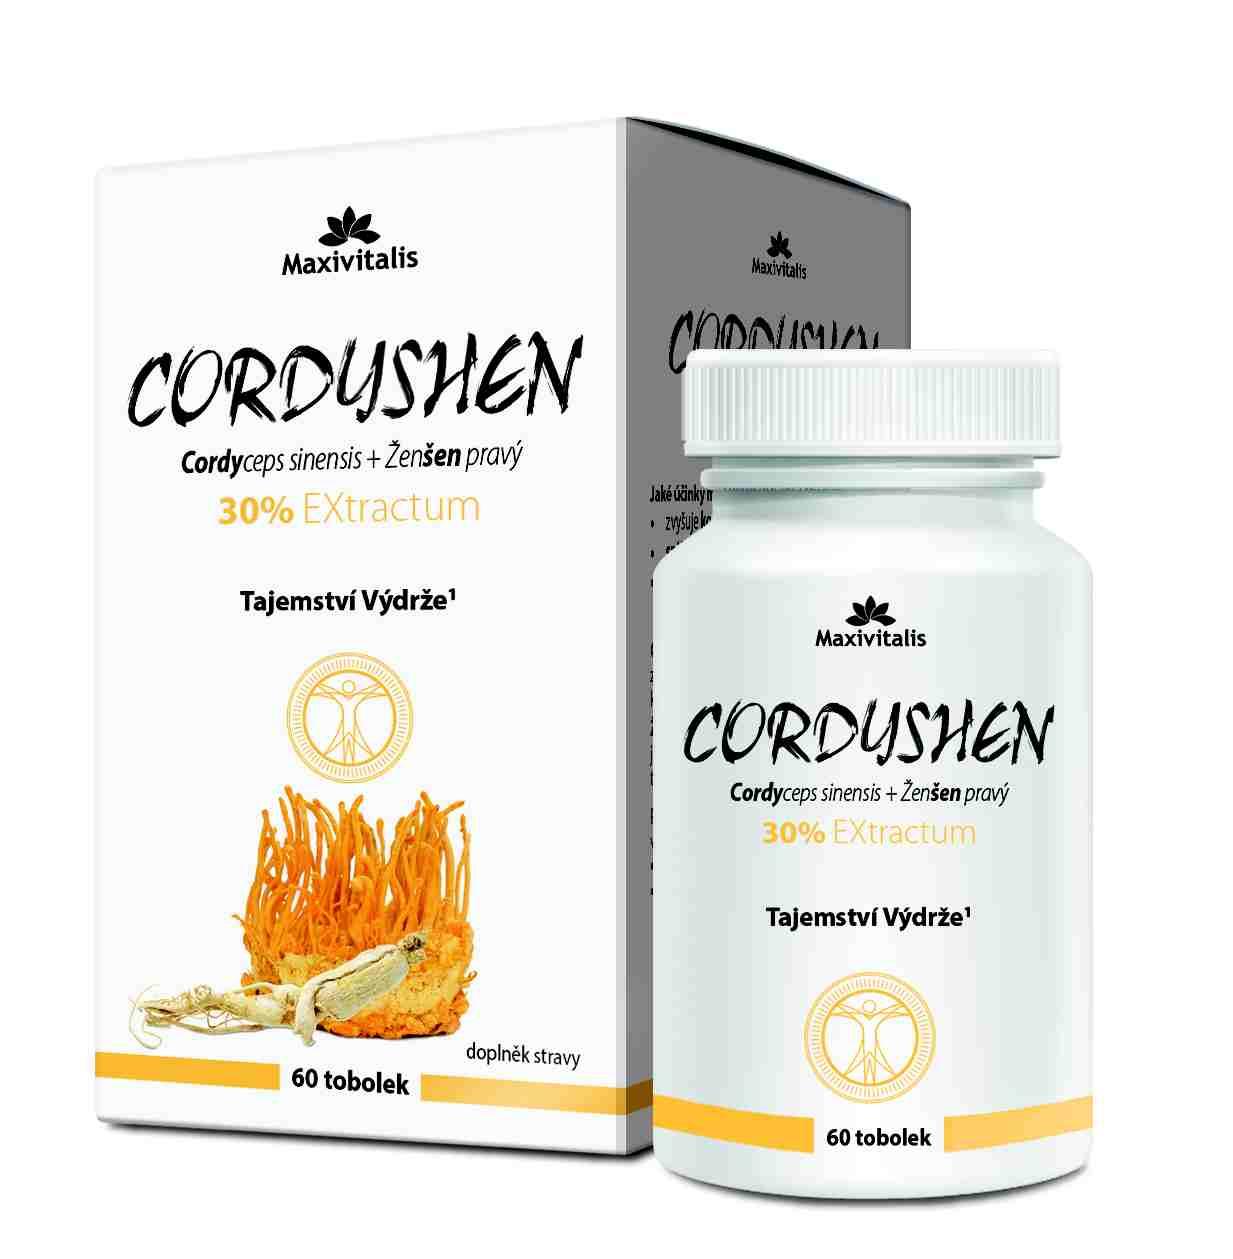 Maxivitalis Cordyshen 30% EXtractum 60 tob.